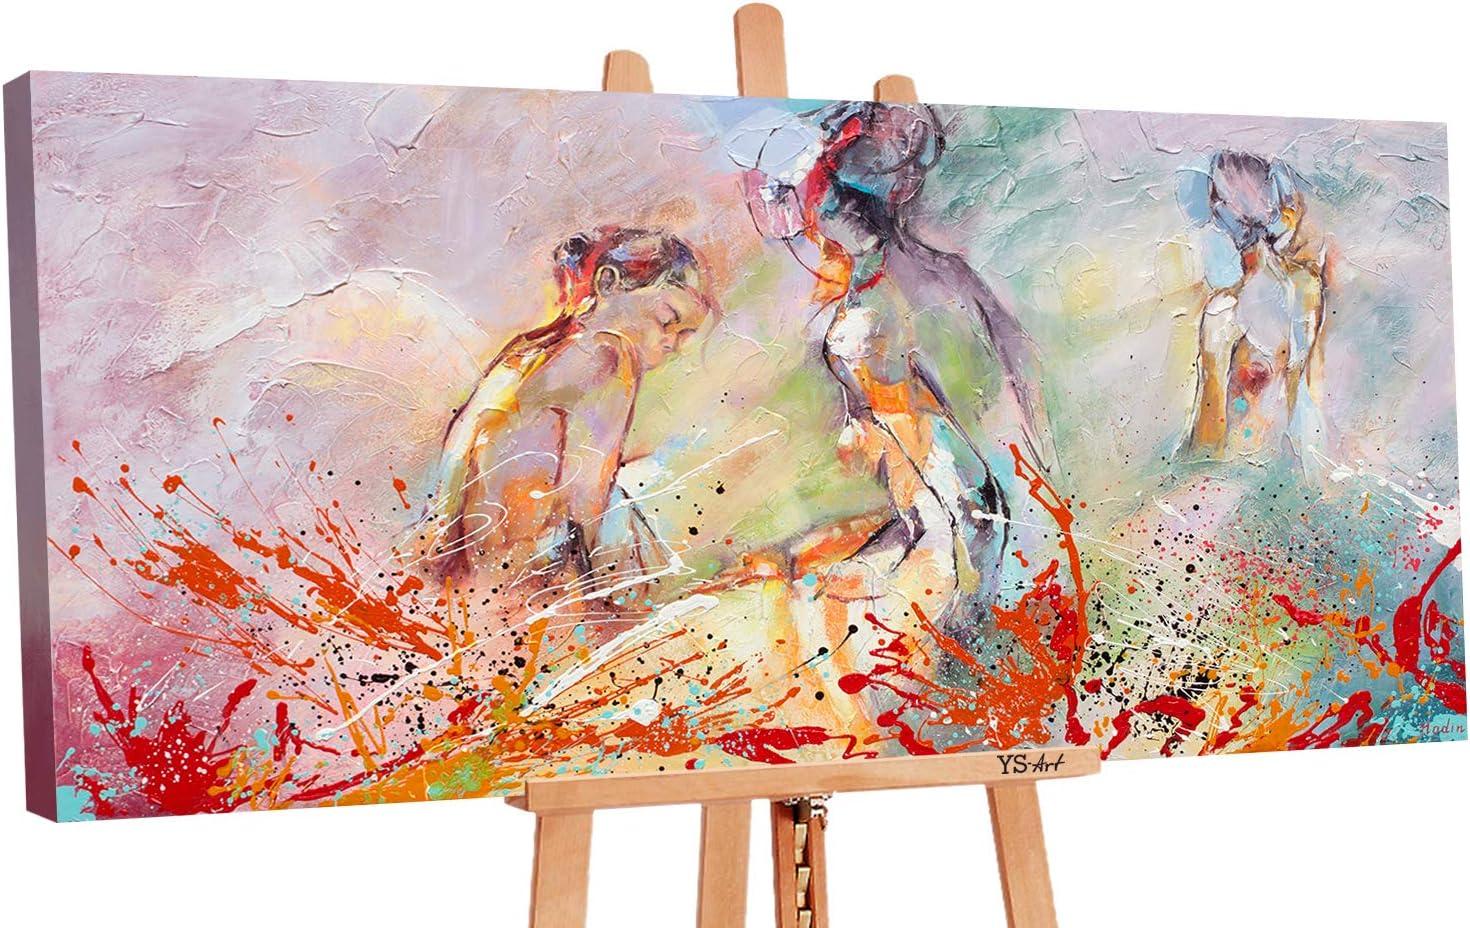 YS-Art Premium | Cuadro Pintado a Mano Verano calurosod | Cuadro Moderno acrilico | 140 x 70 cm | Lienzo Pintado a Mano | Cuadros Dormitories | único | Multicolor | PS058